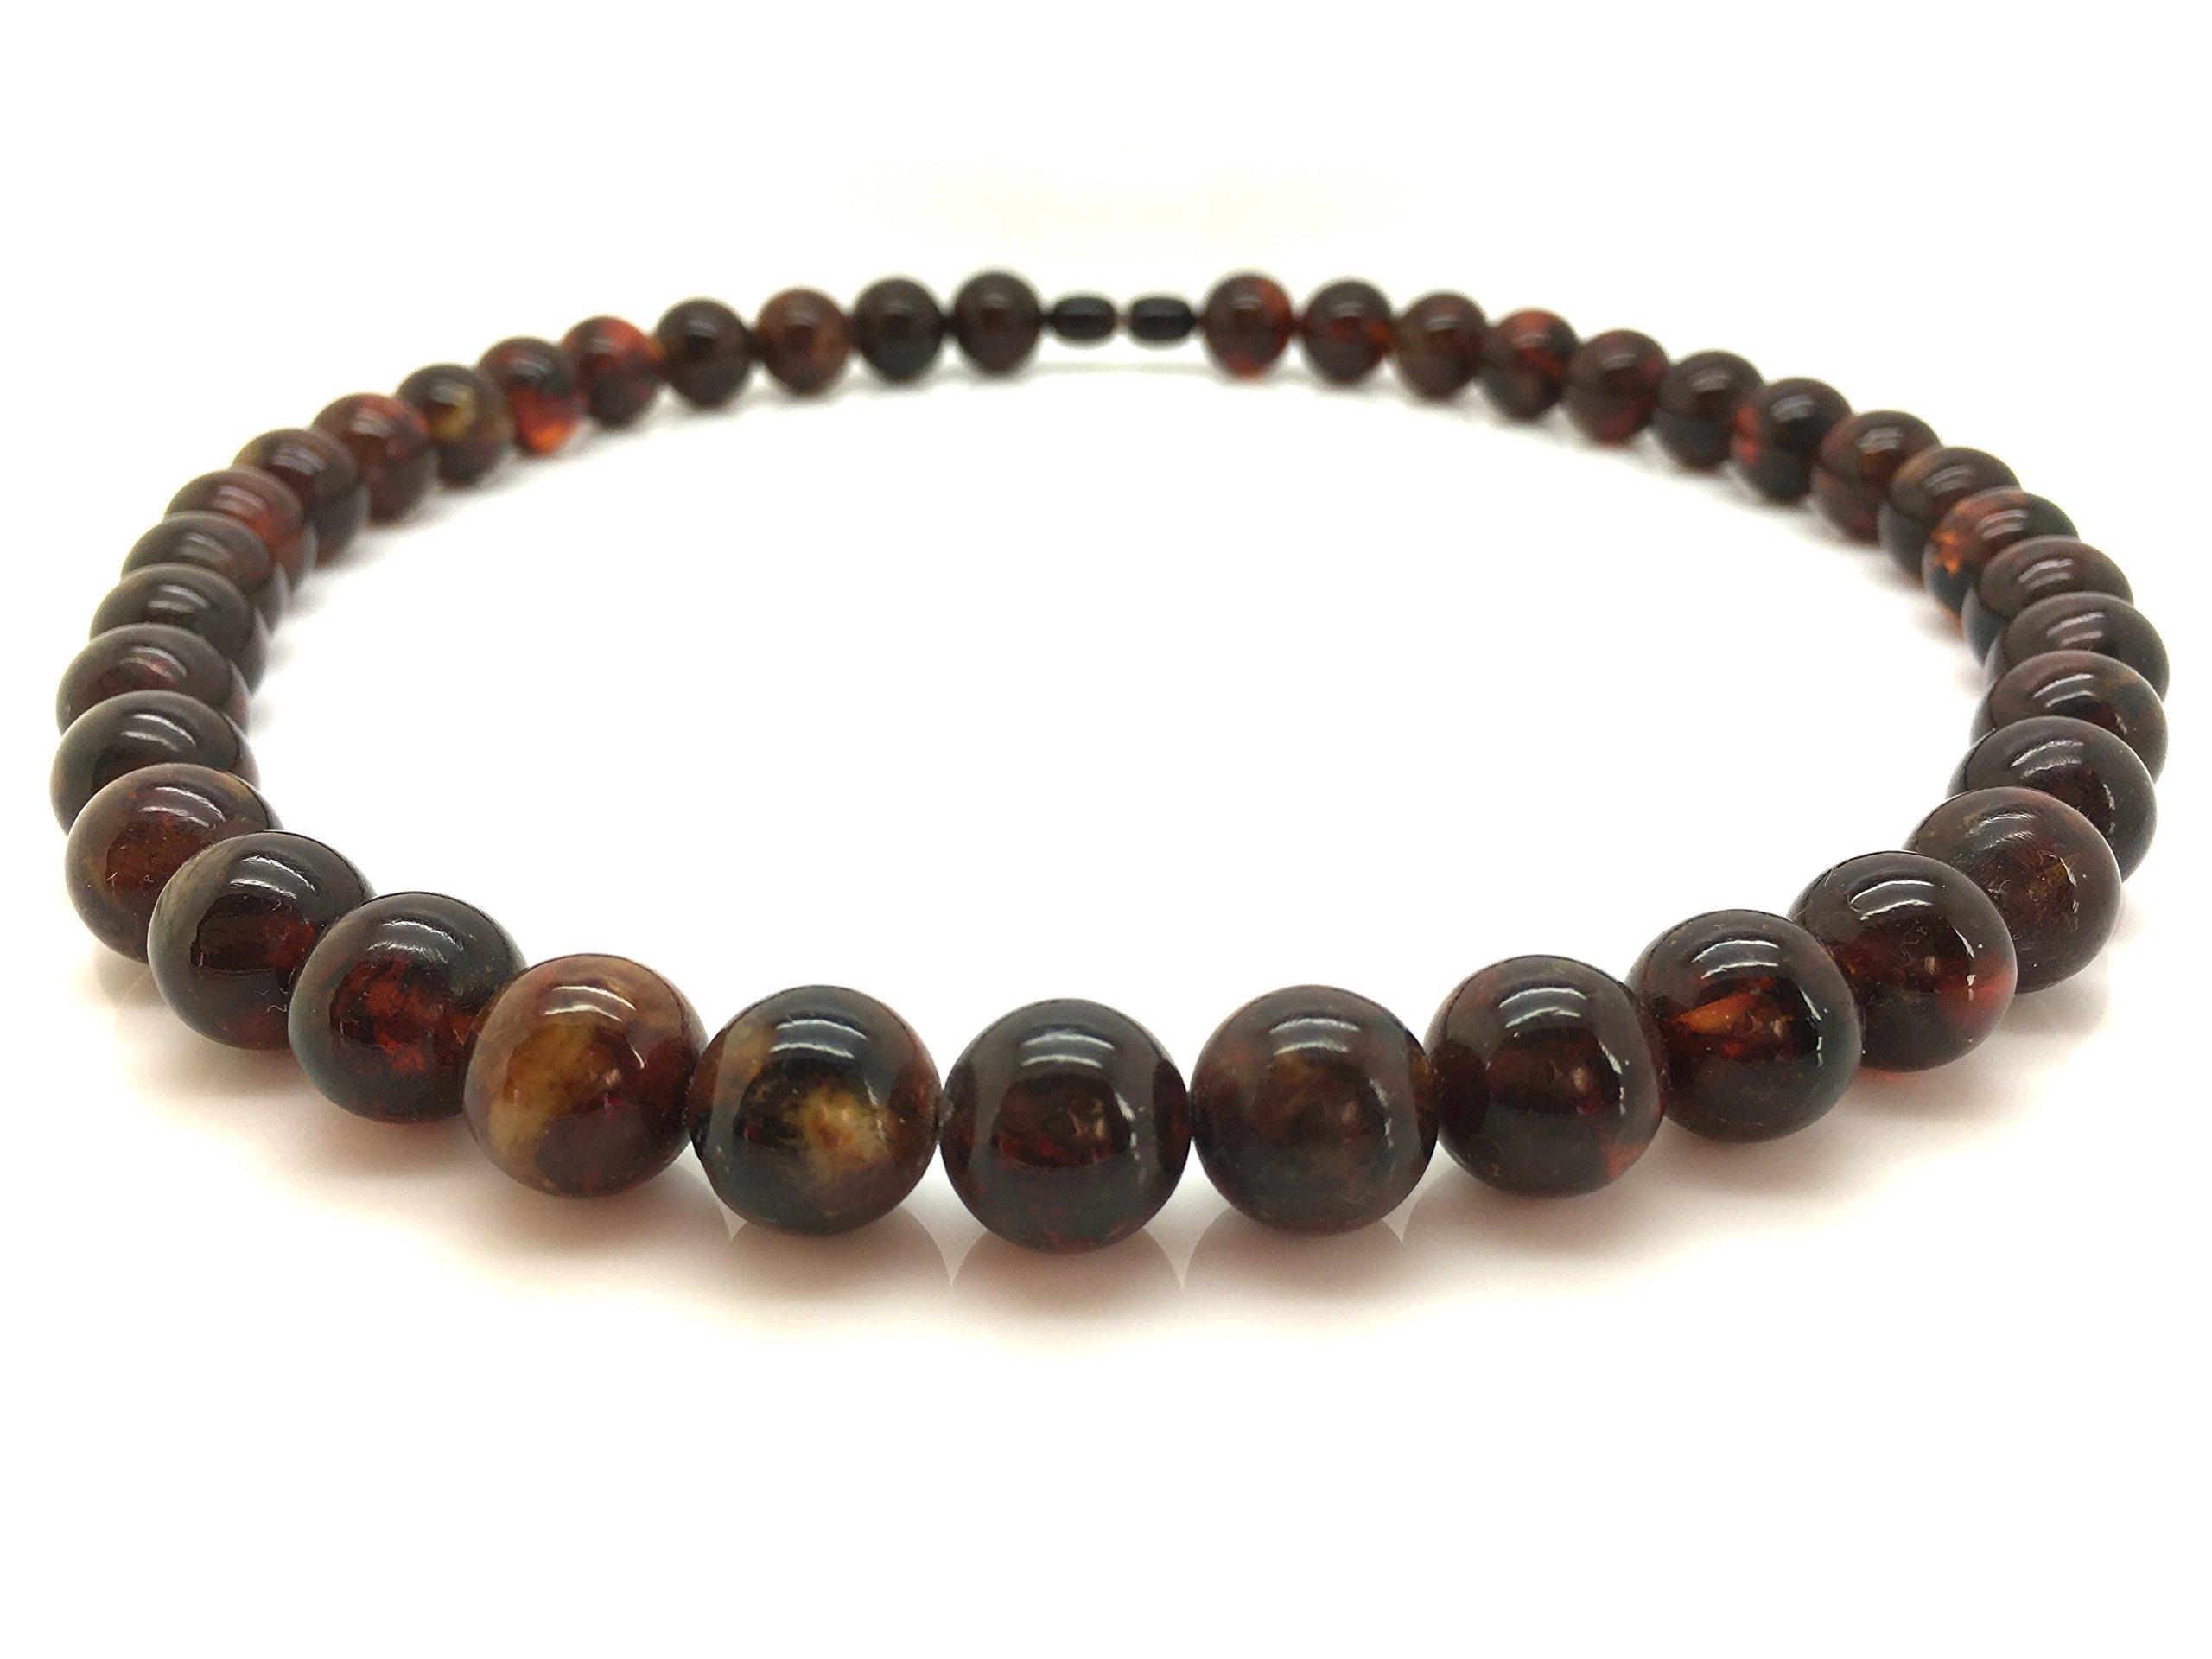 Natural Baltic Amber Necklace Cognac Colour 49,2g 13± mm Size.